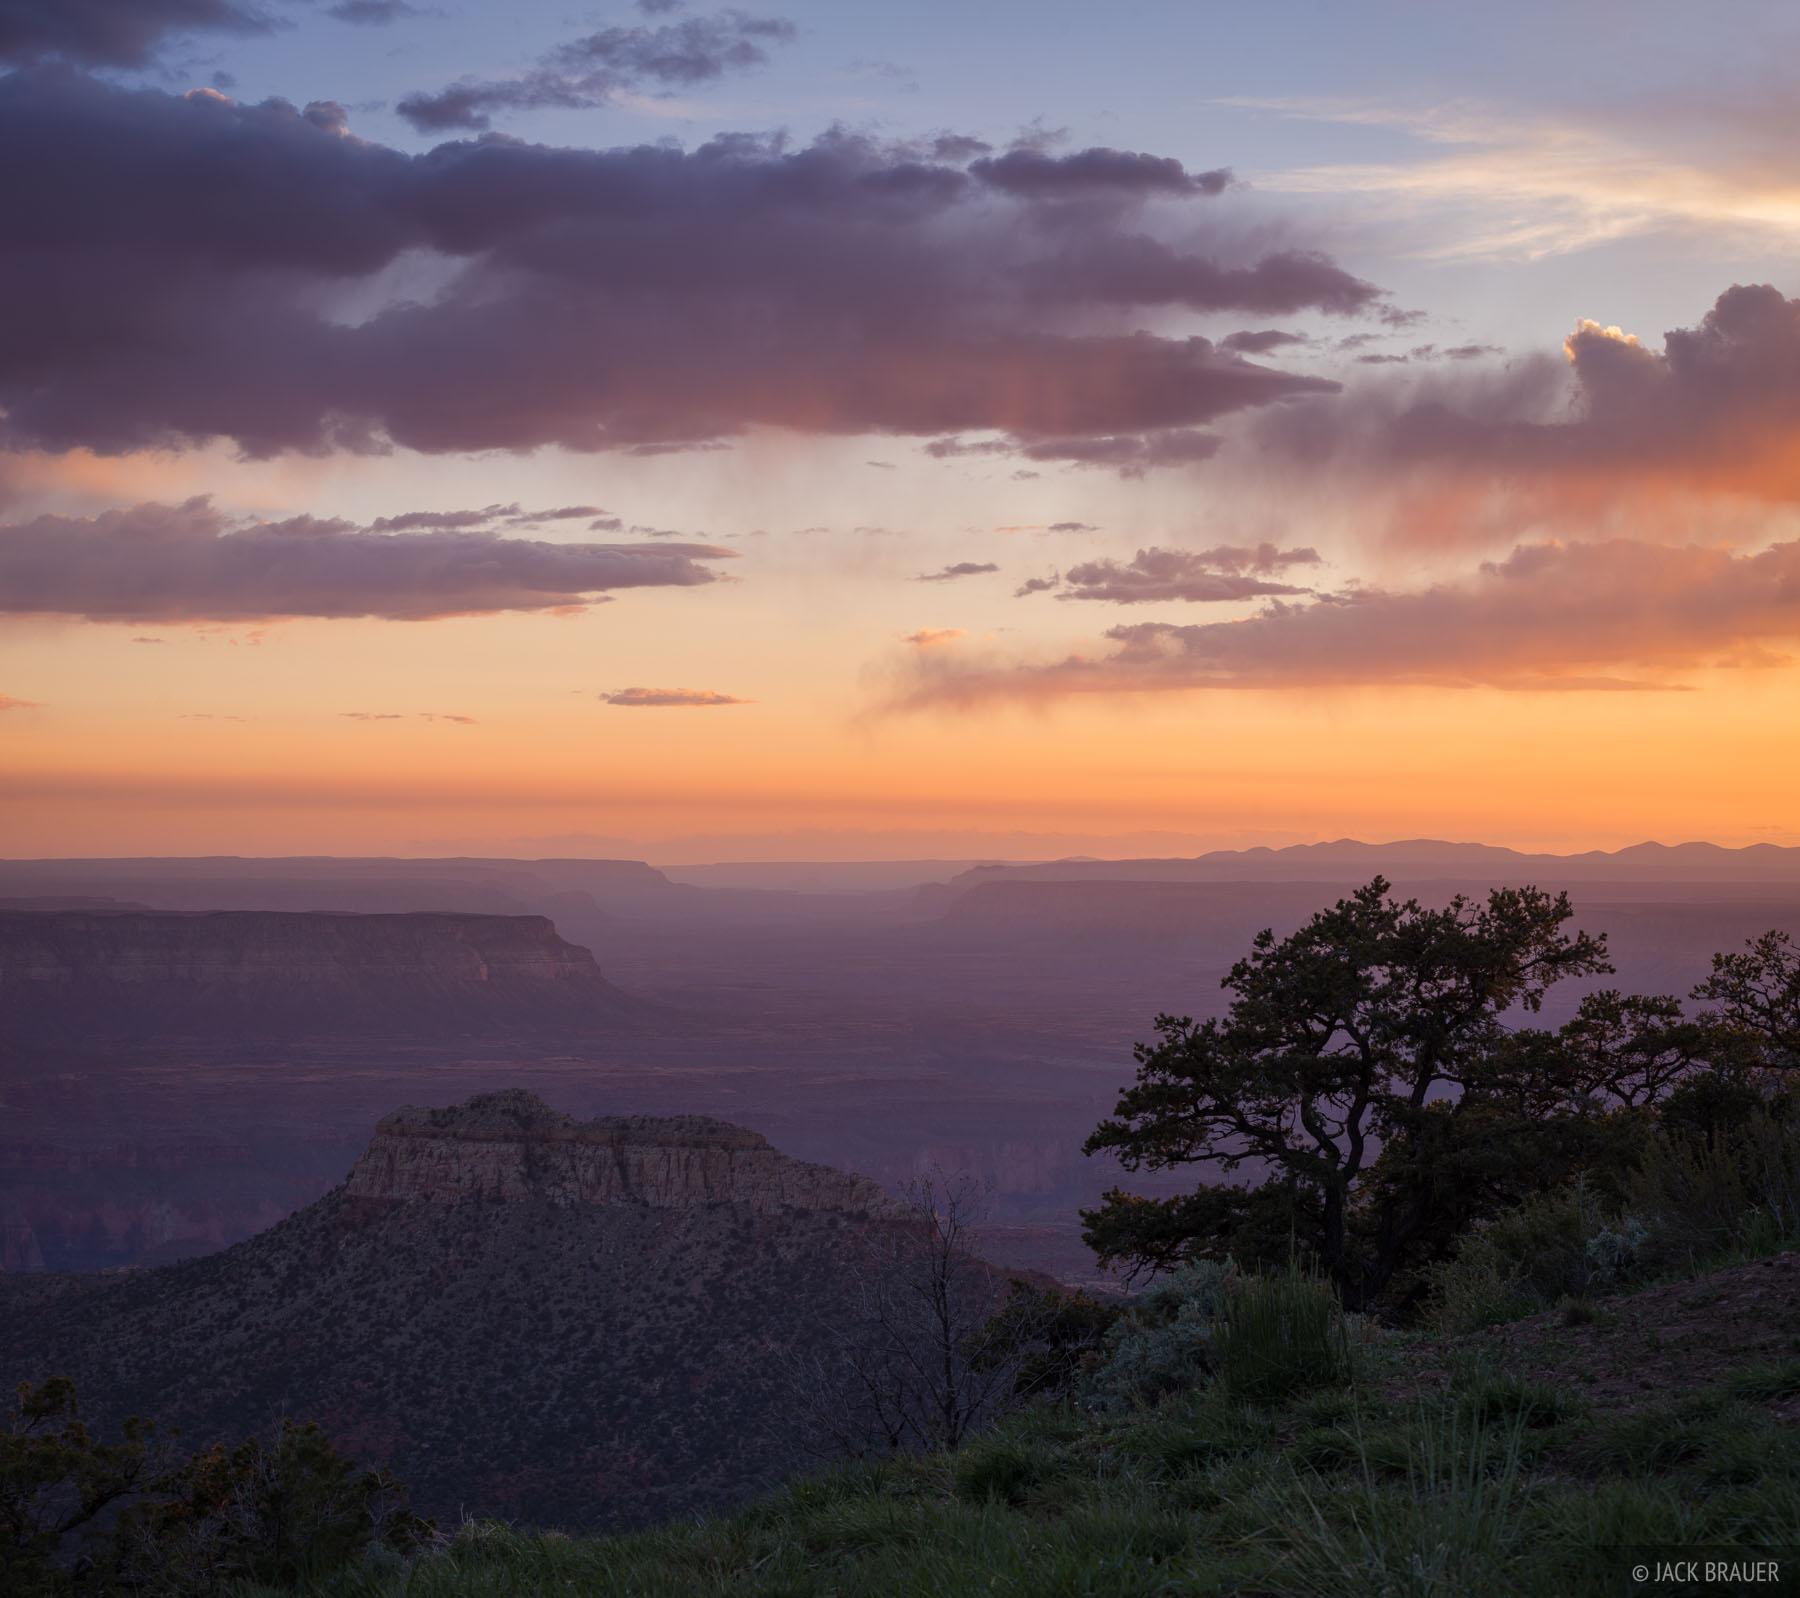 Arizona,Grand Canyon, sunset, Crazy Jug Point, photo